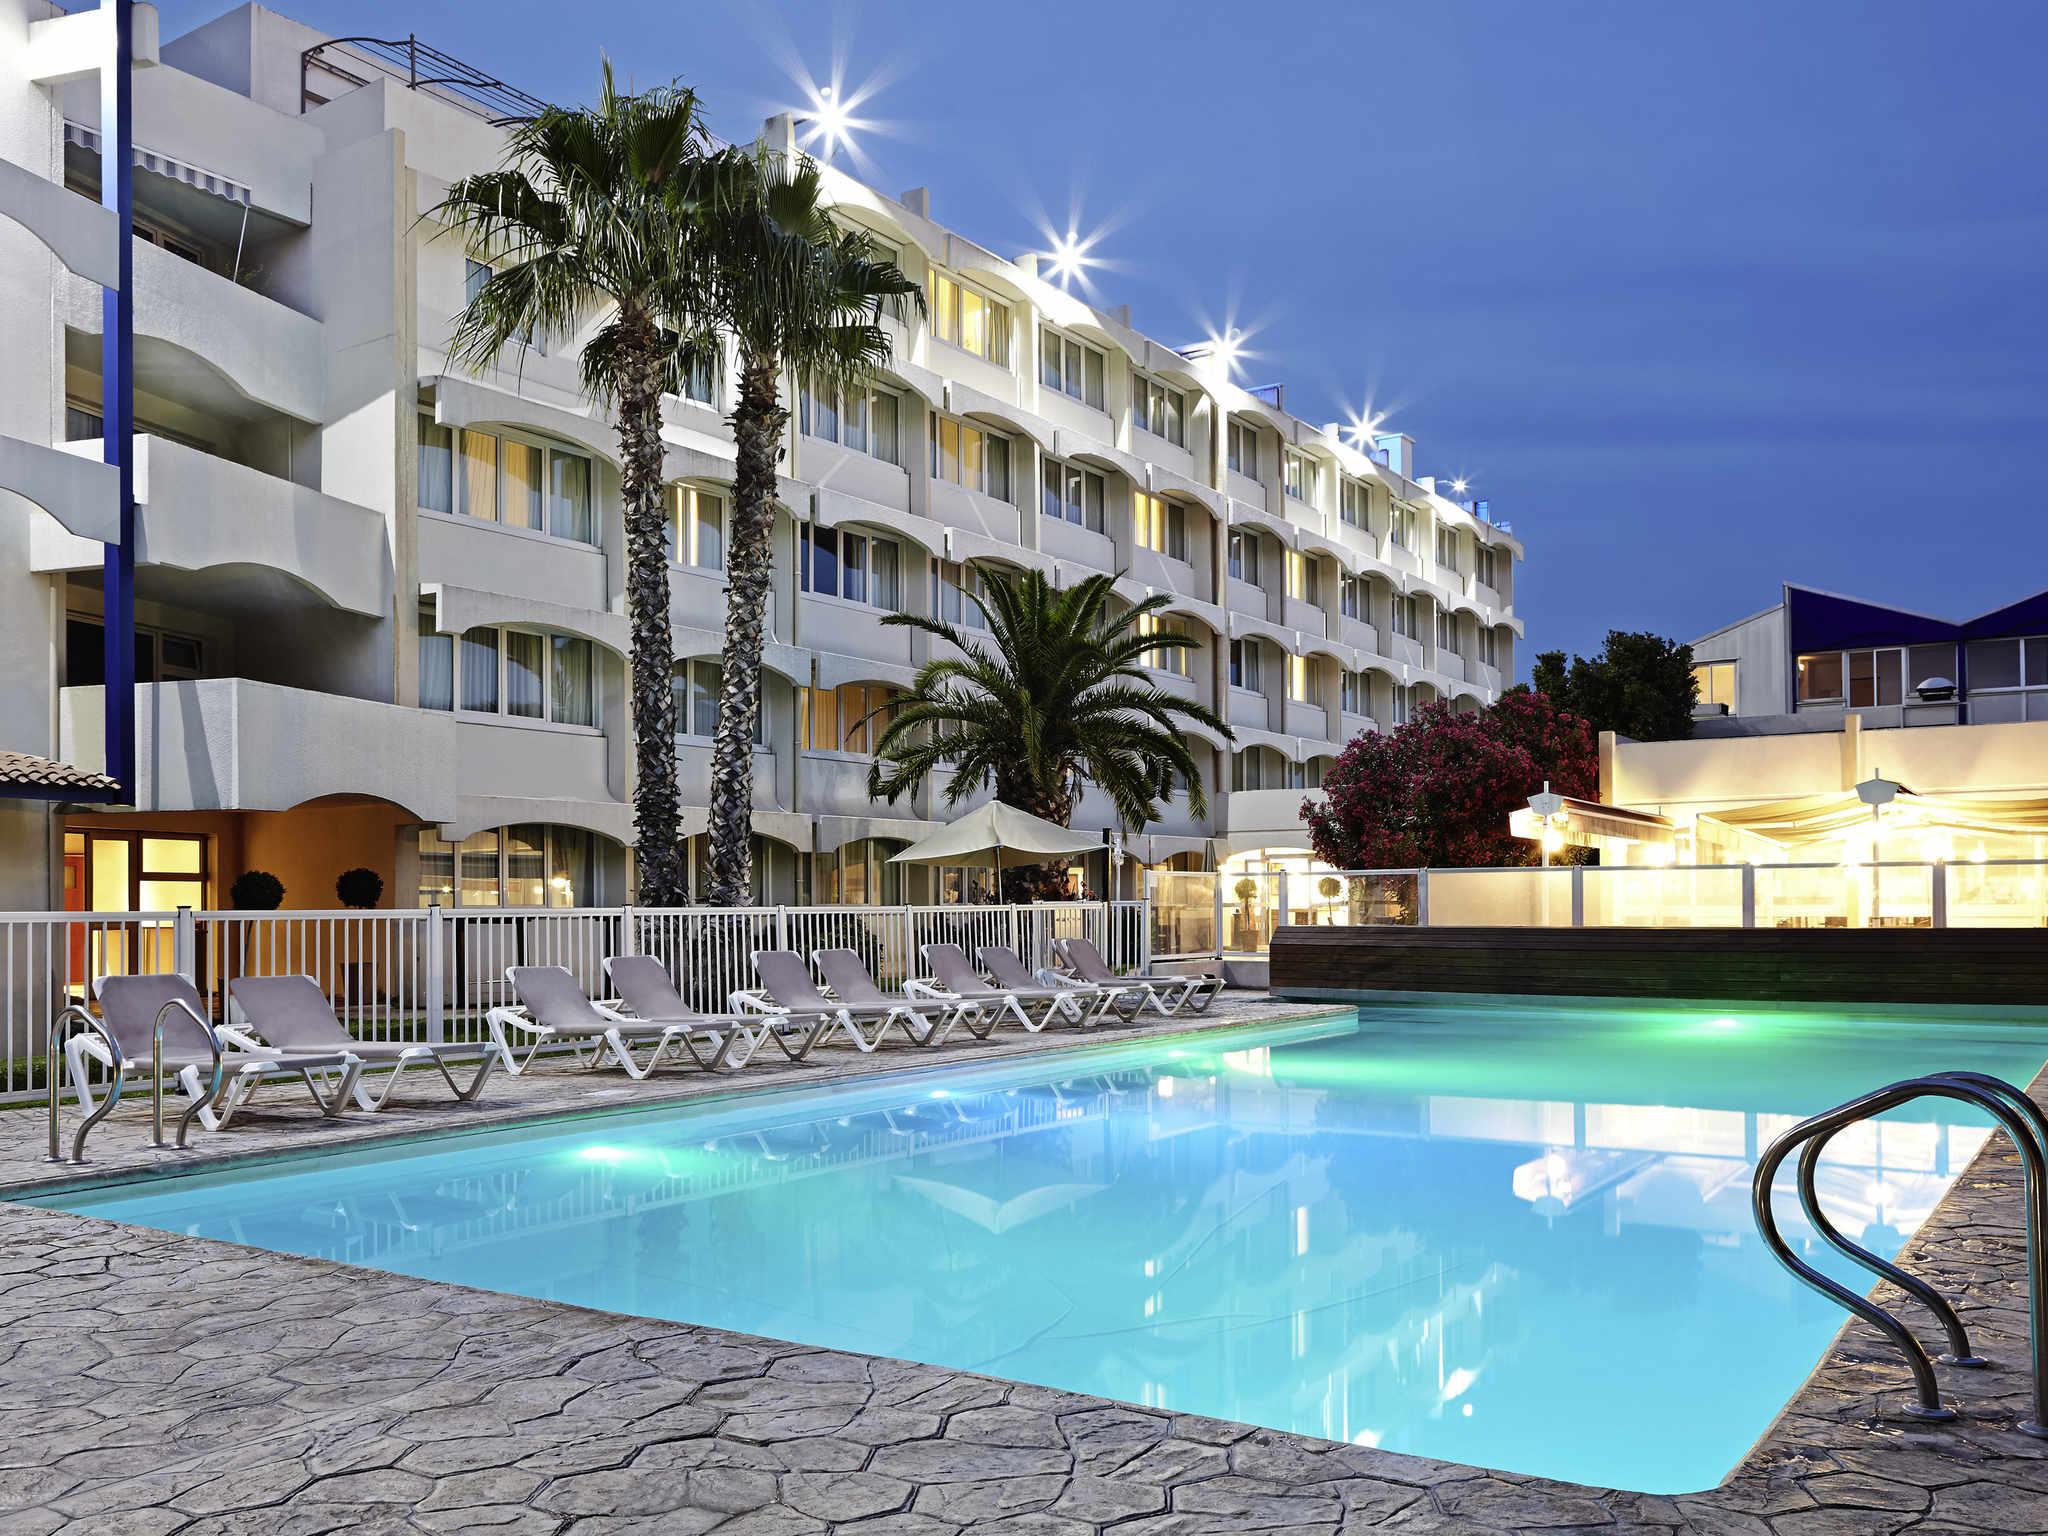 Hotel – Novotel Montpellier